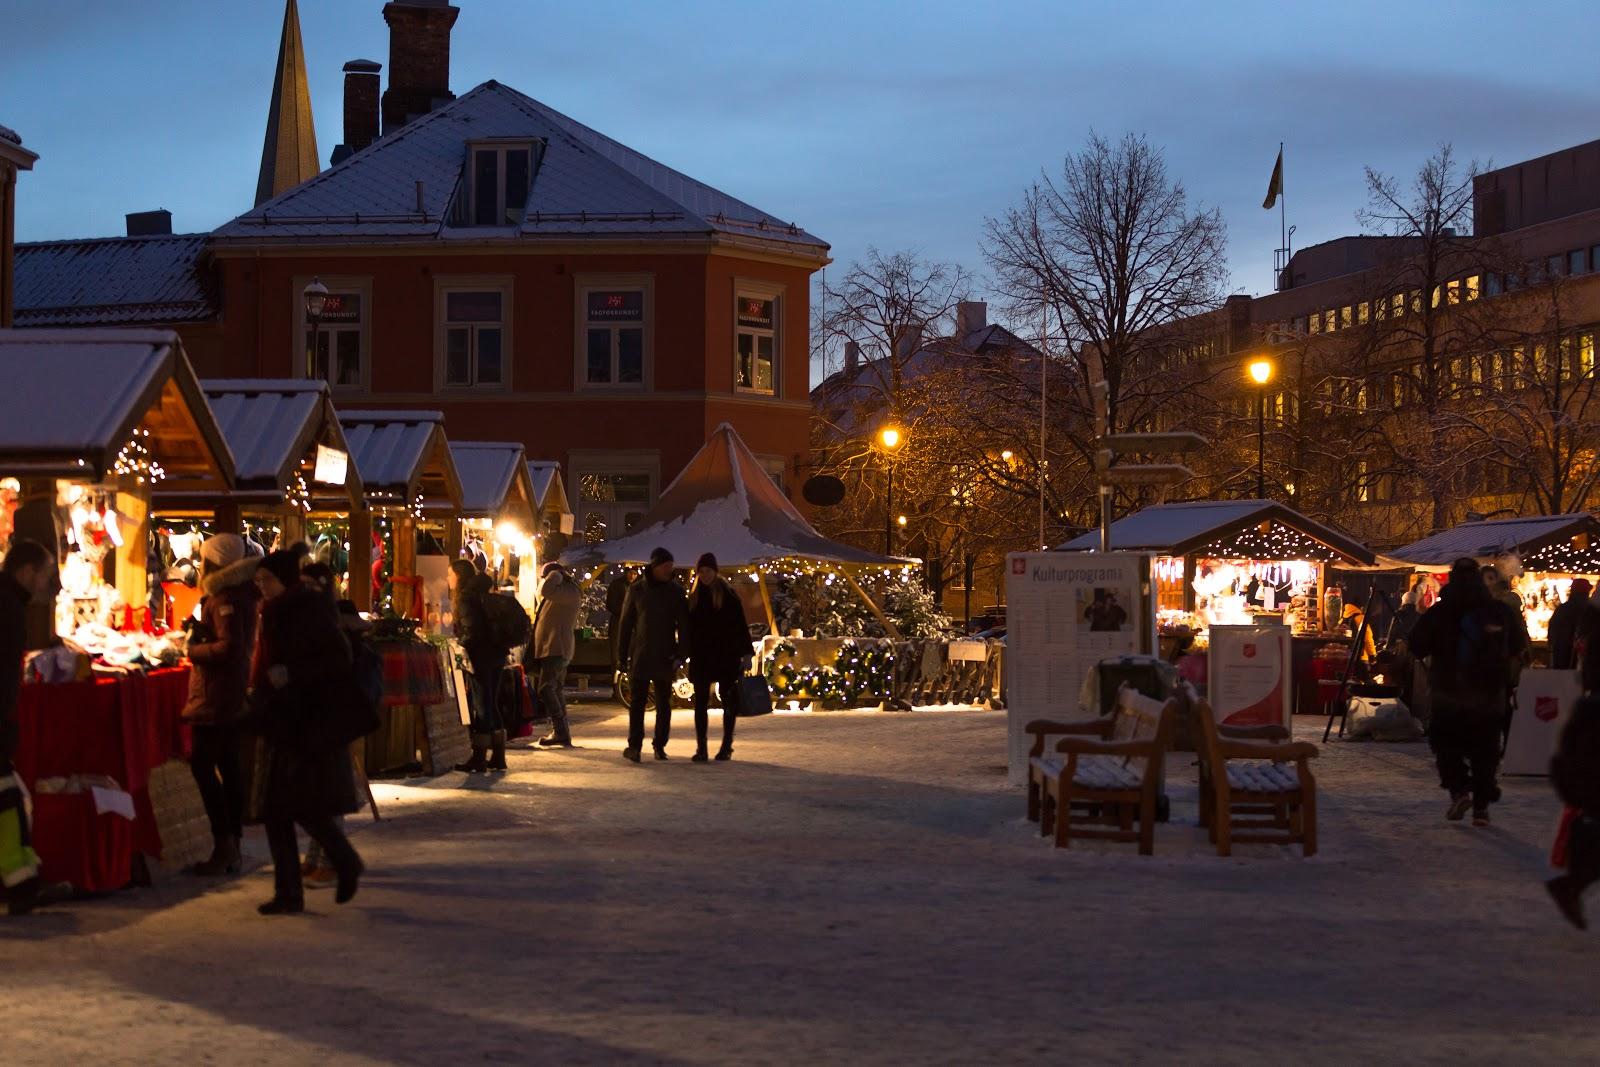 Trondheim's Market Square Christmas Market or Julemarkedet. Photo: Sven-Erik Knoff | www.fotoknoff.no